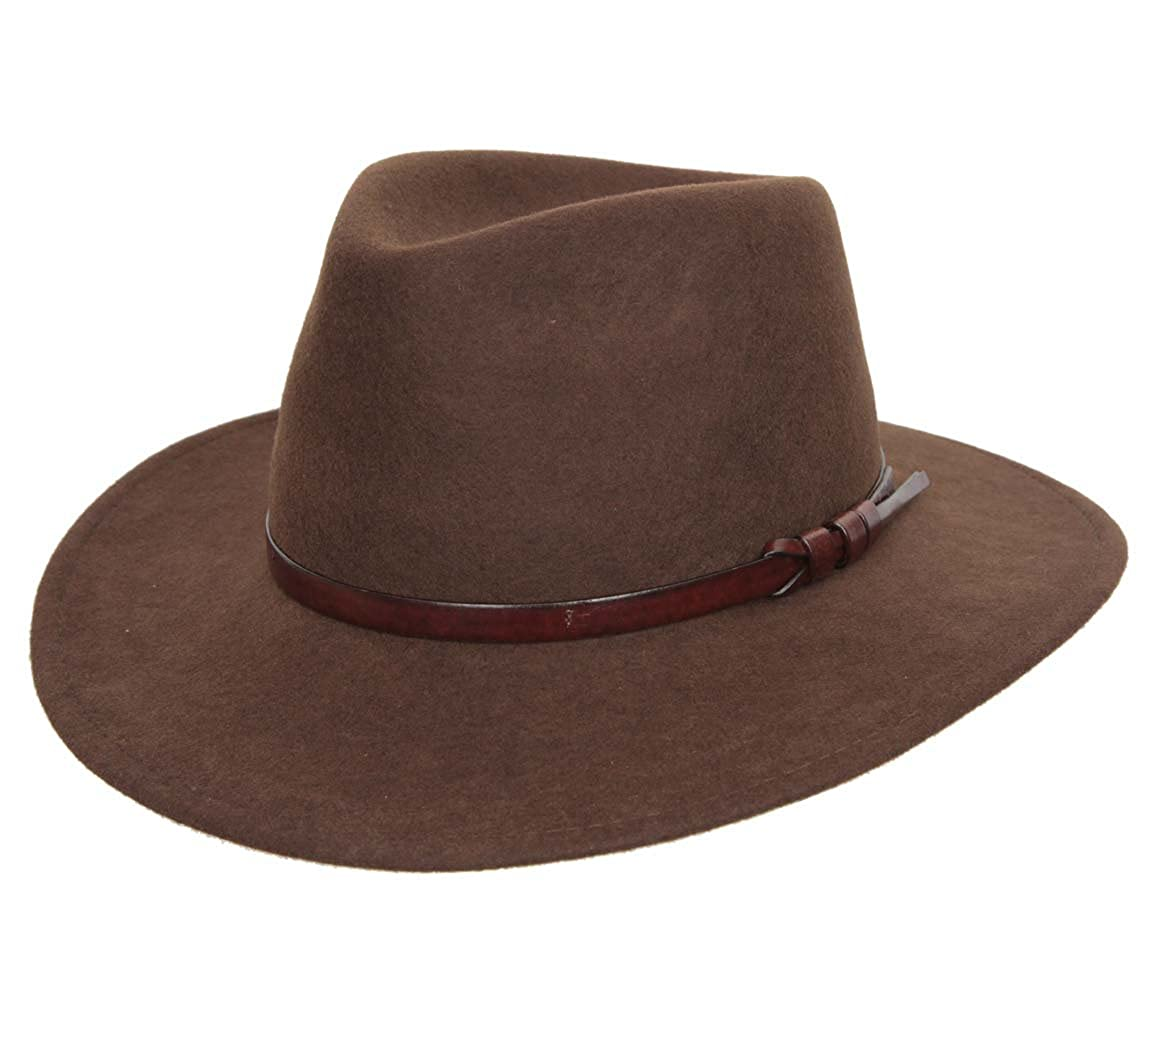 Classic Italy - Fedora Hat wool felt men Classique Large